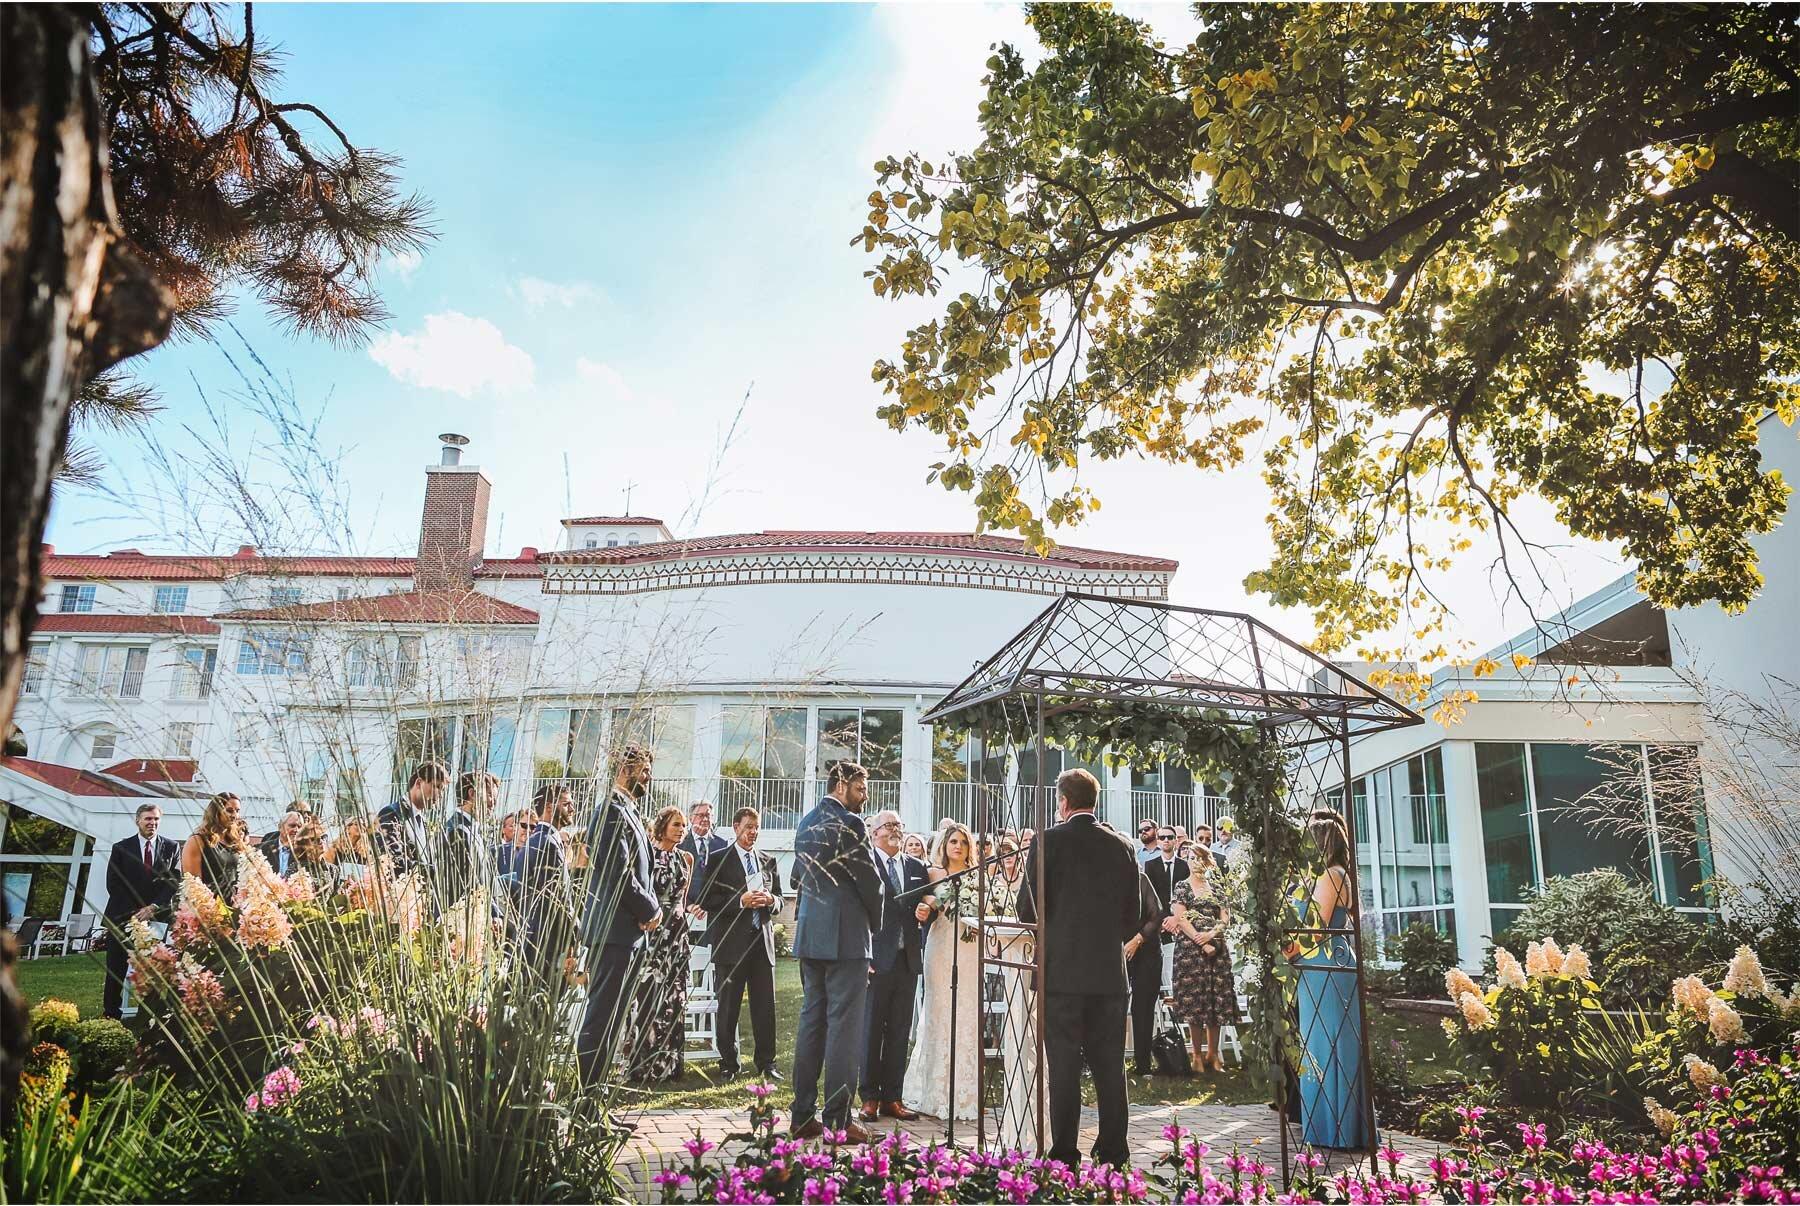 13-Vick-Photography-Wedding-Minnetonka-Minnesota-Lafayette-Club-Outdoor-Ceremony-Katie-and-David.jpg